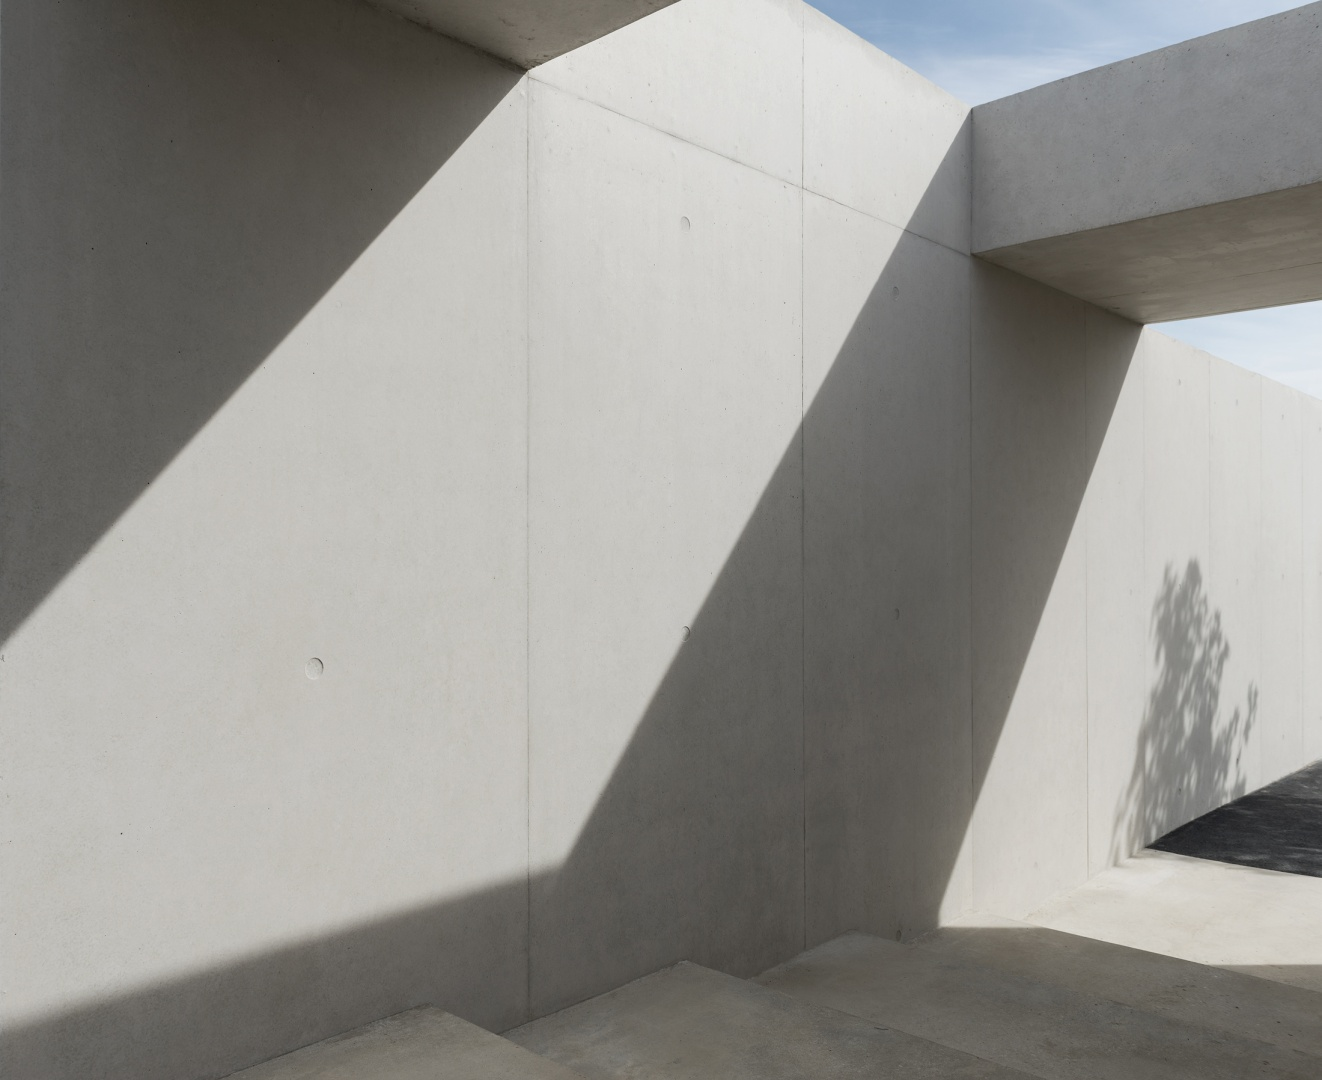 Eingangstreppe © Leo Fabrizio, Lausanne